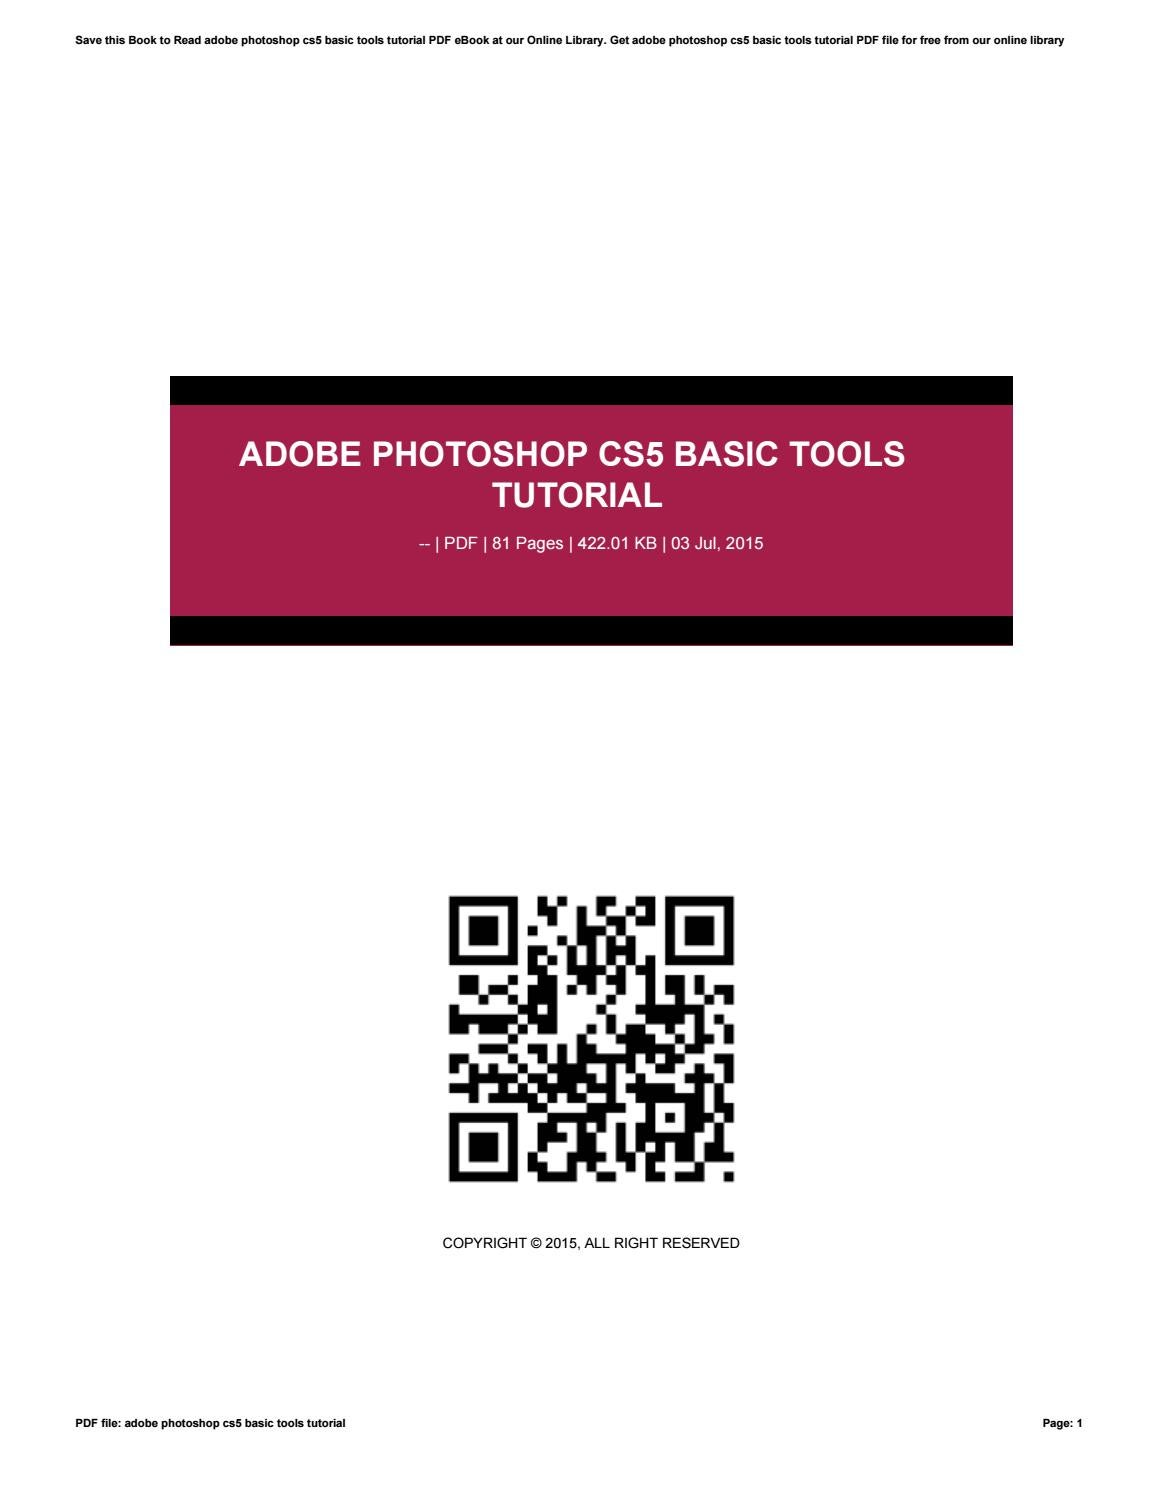 Adobe photoshop cs5 tutorials for beginners pdf choice image any adobe photoshop cs5 basic tools tutorial by nezzart9 issuu baditri choice image baditri Choice Image